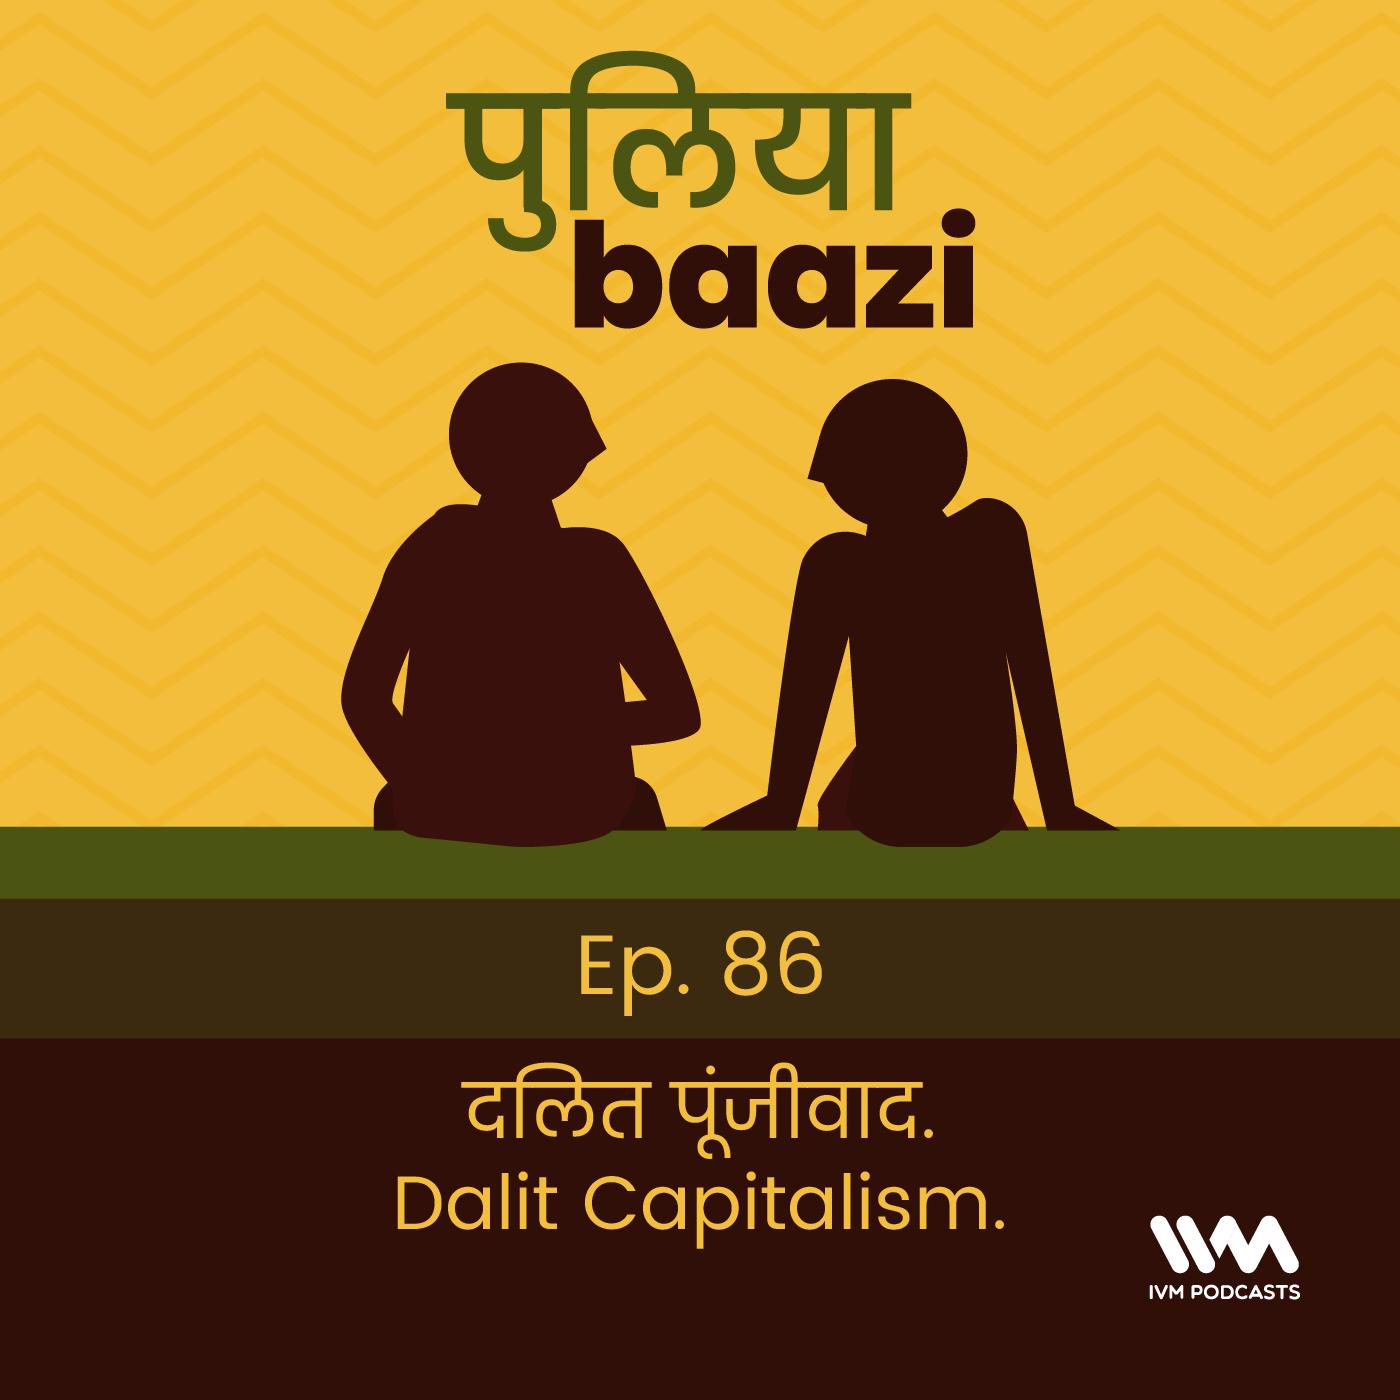 Ep. 86: दलित पूंजीवाद. Dalit Capitalism.